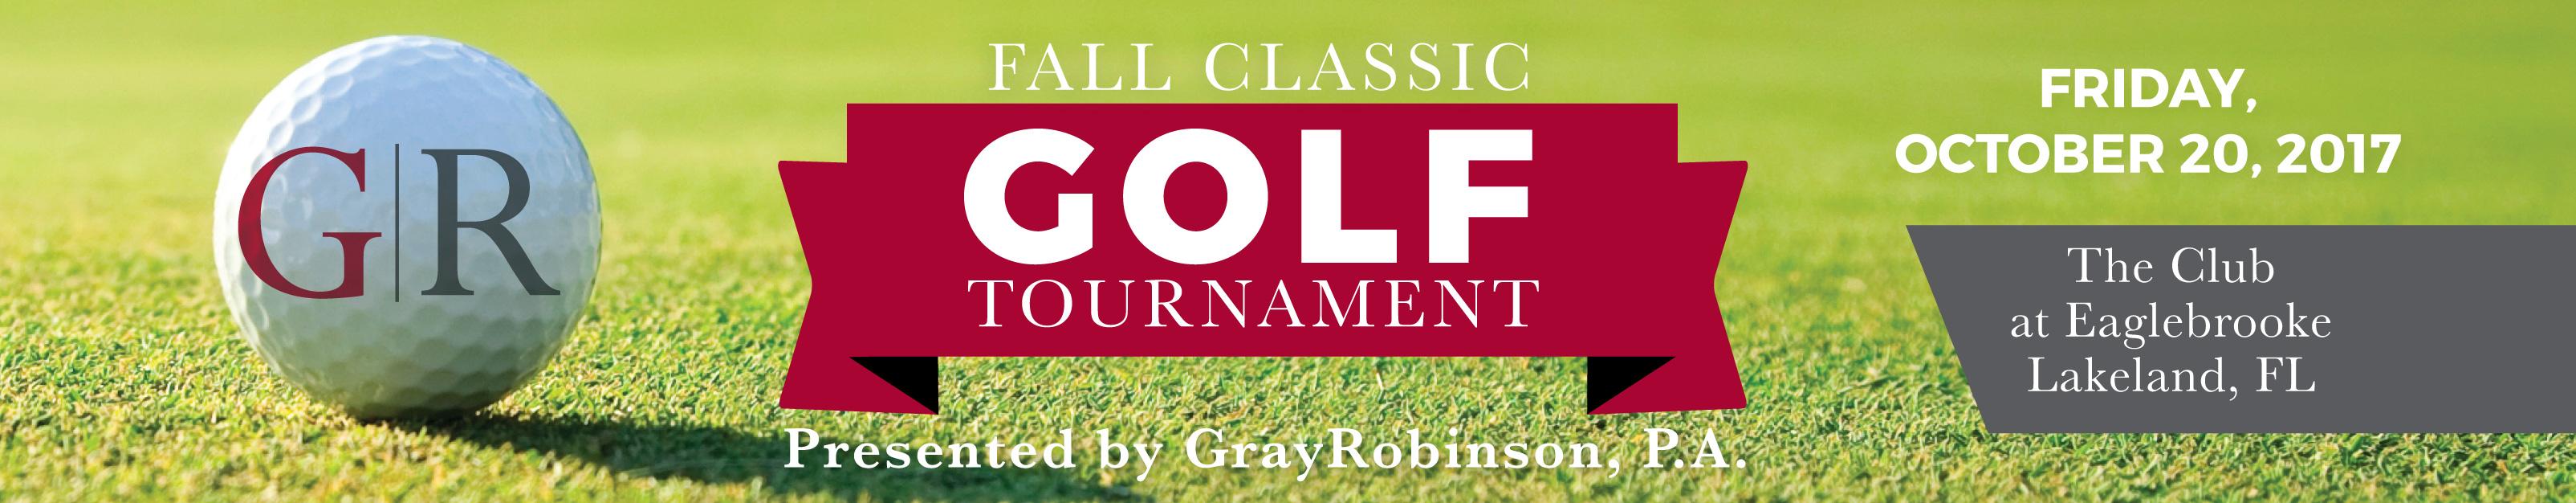 GrayRobinson Lakeland Fall Classic Golf Tournament